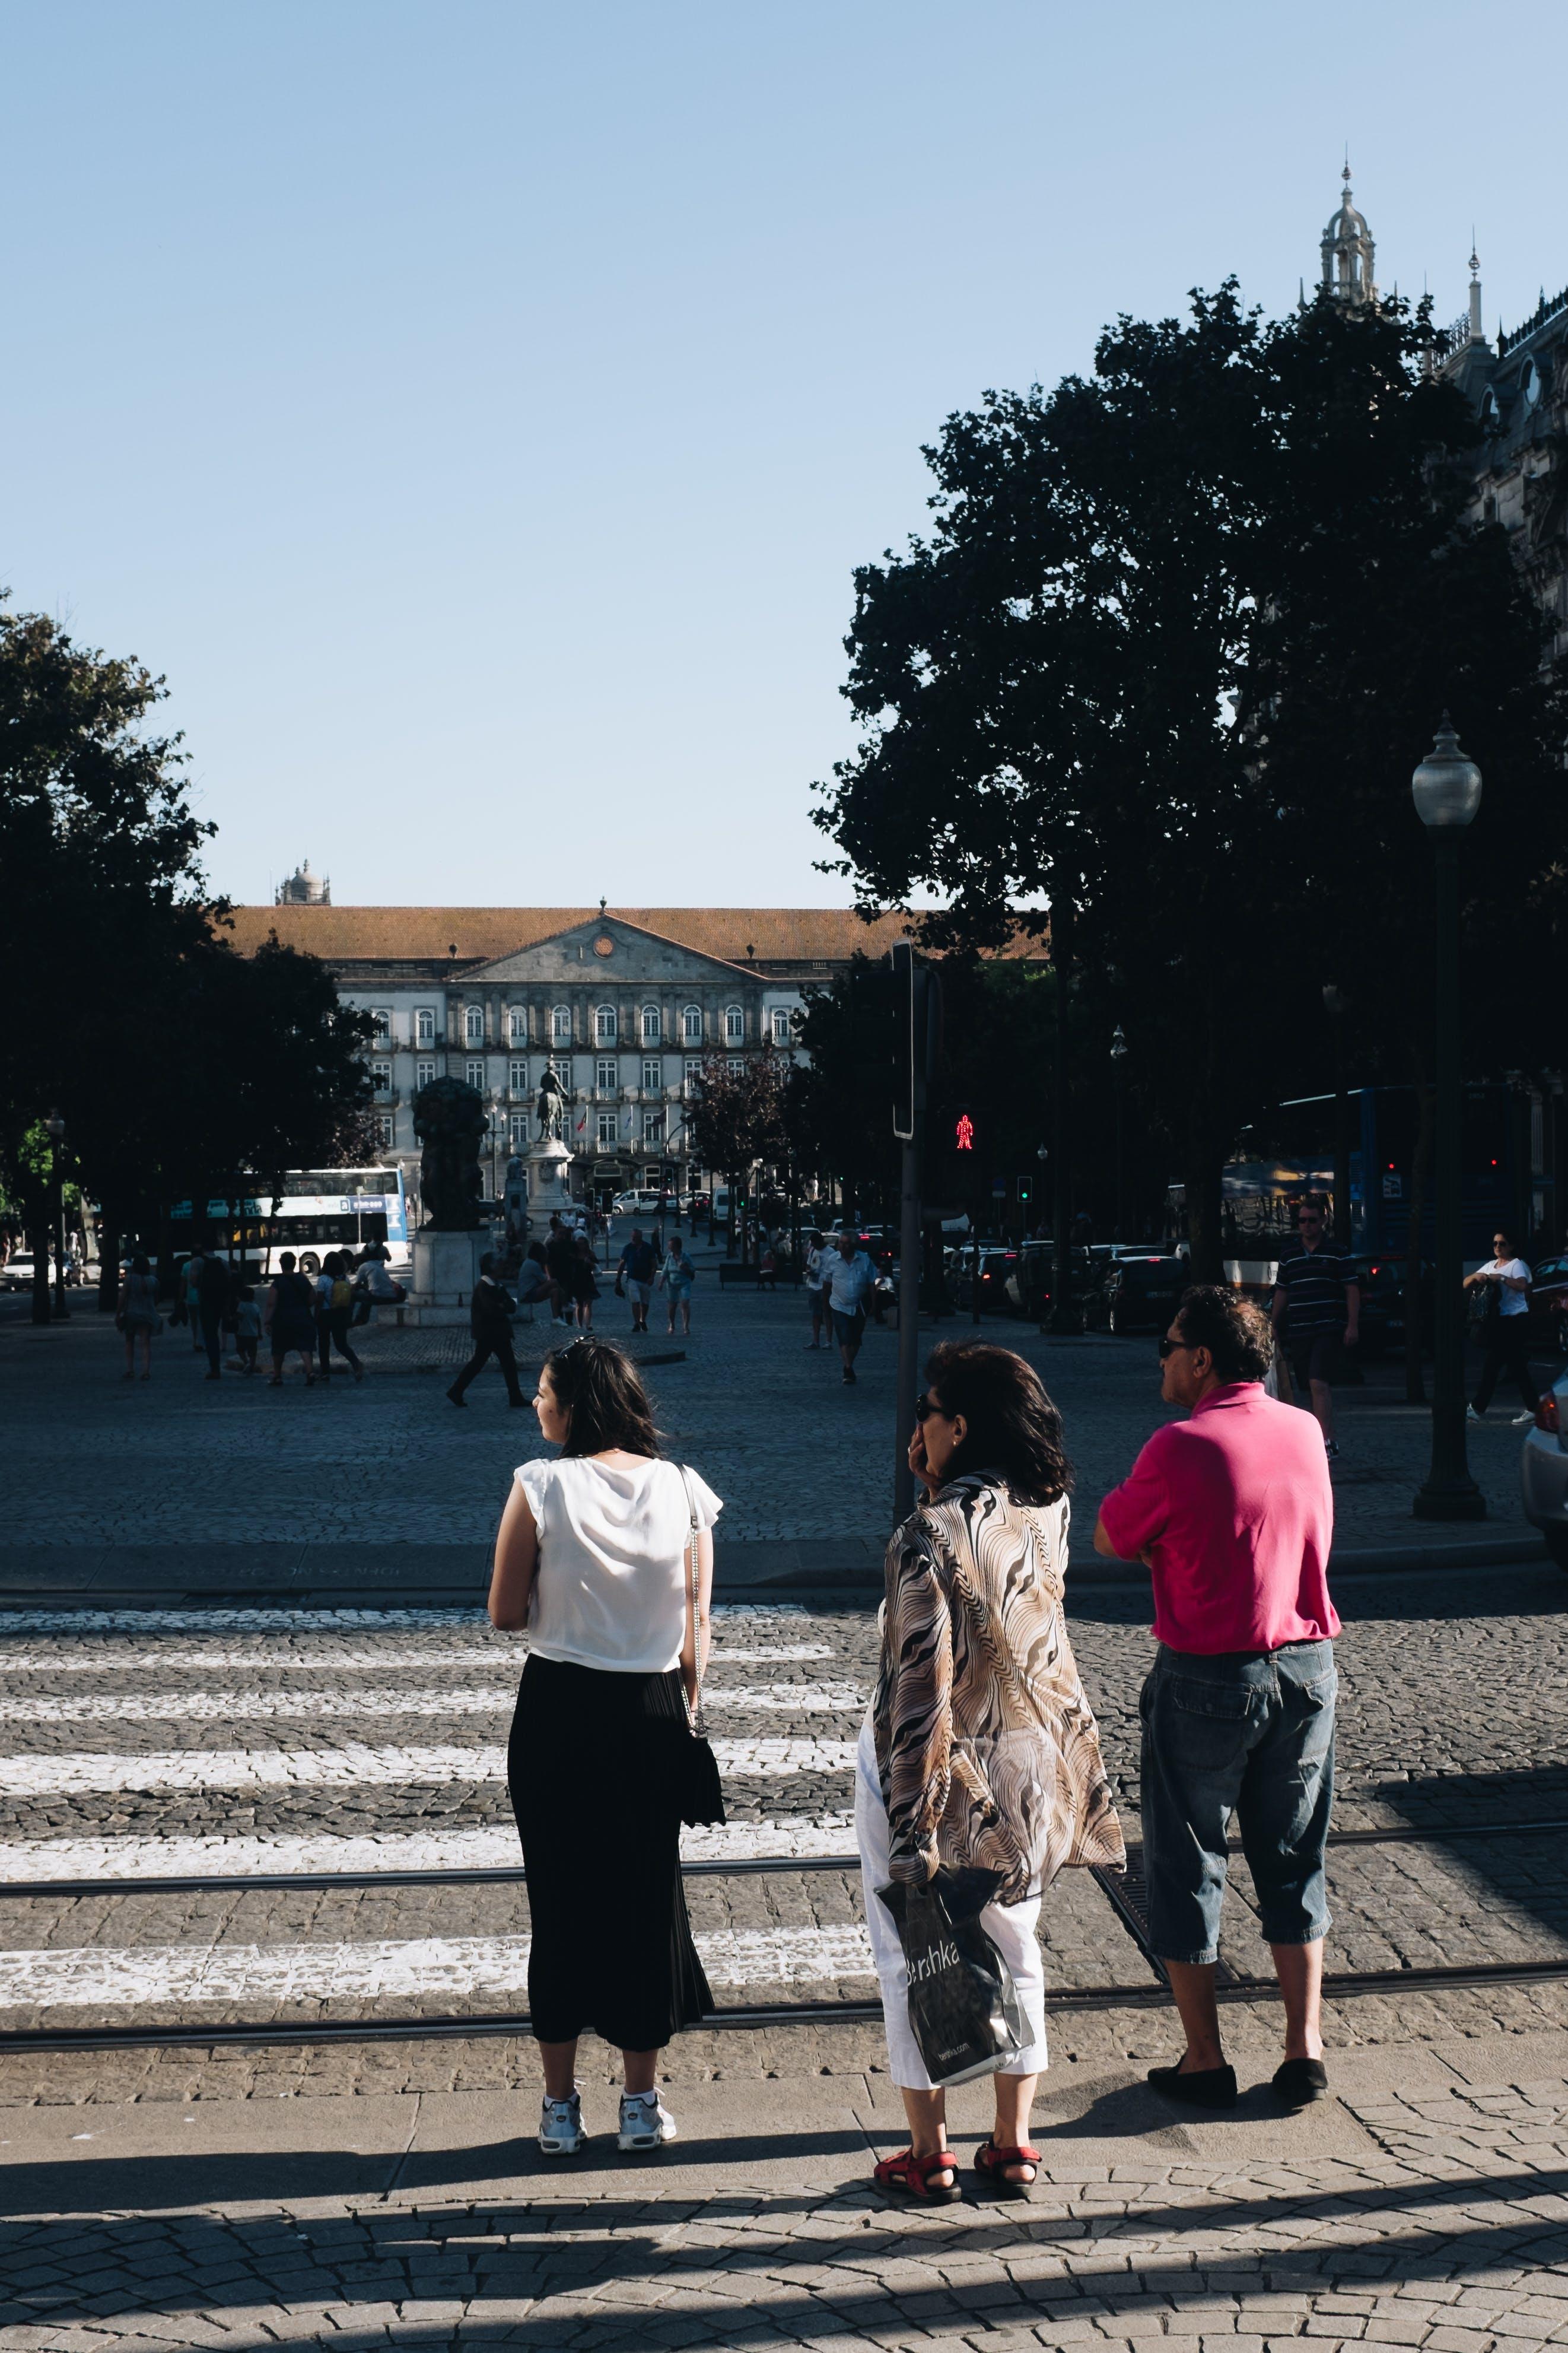 Fotos de stock gratuitas de calle, carretera, carril peatonal, gente